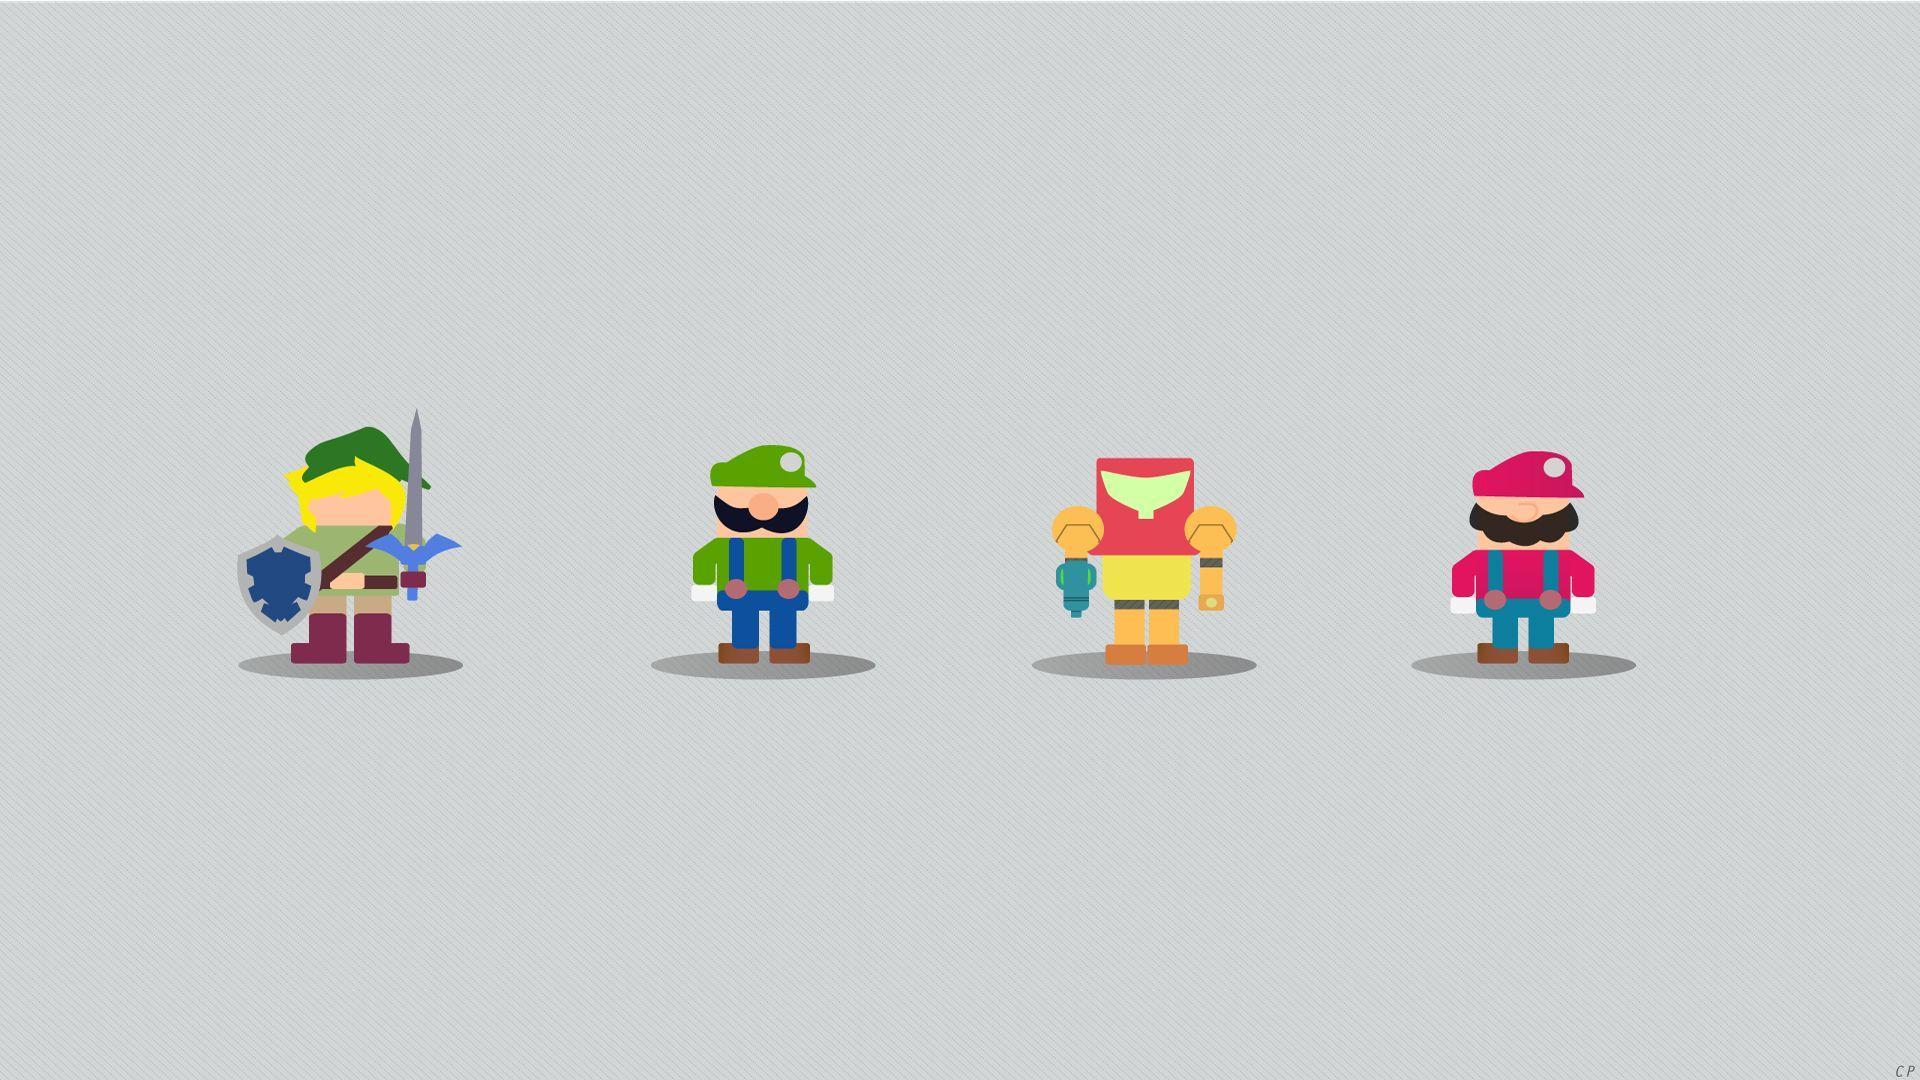 Nintendo Minimalist Wallpapers Top Free Nintendo Minimalist Backgrounds Wallpaperaccess